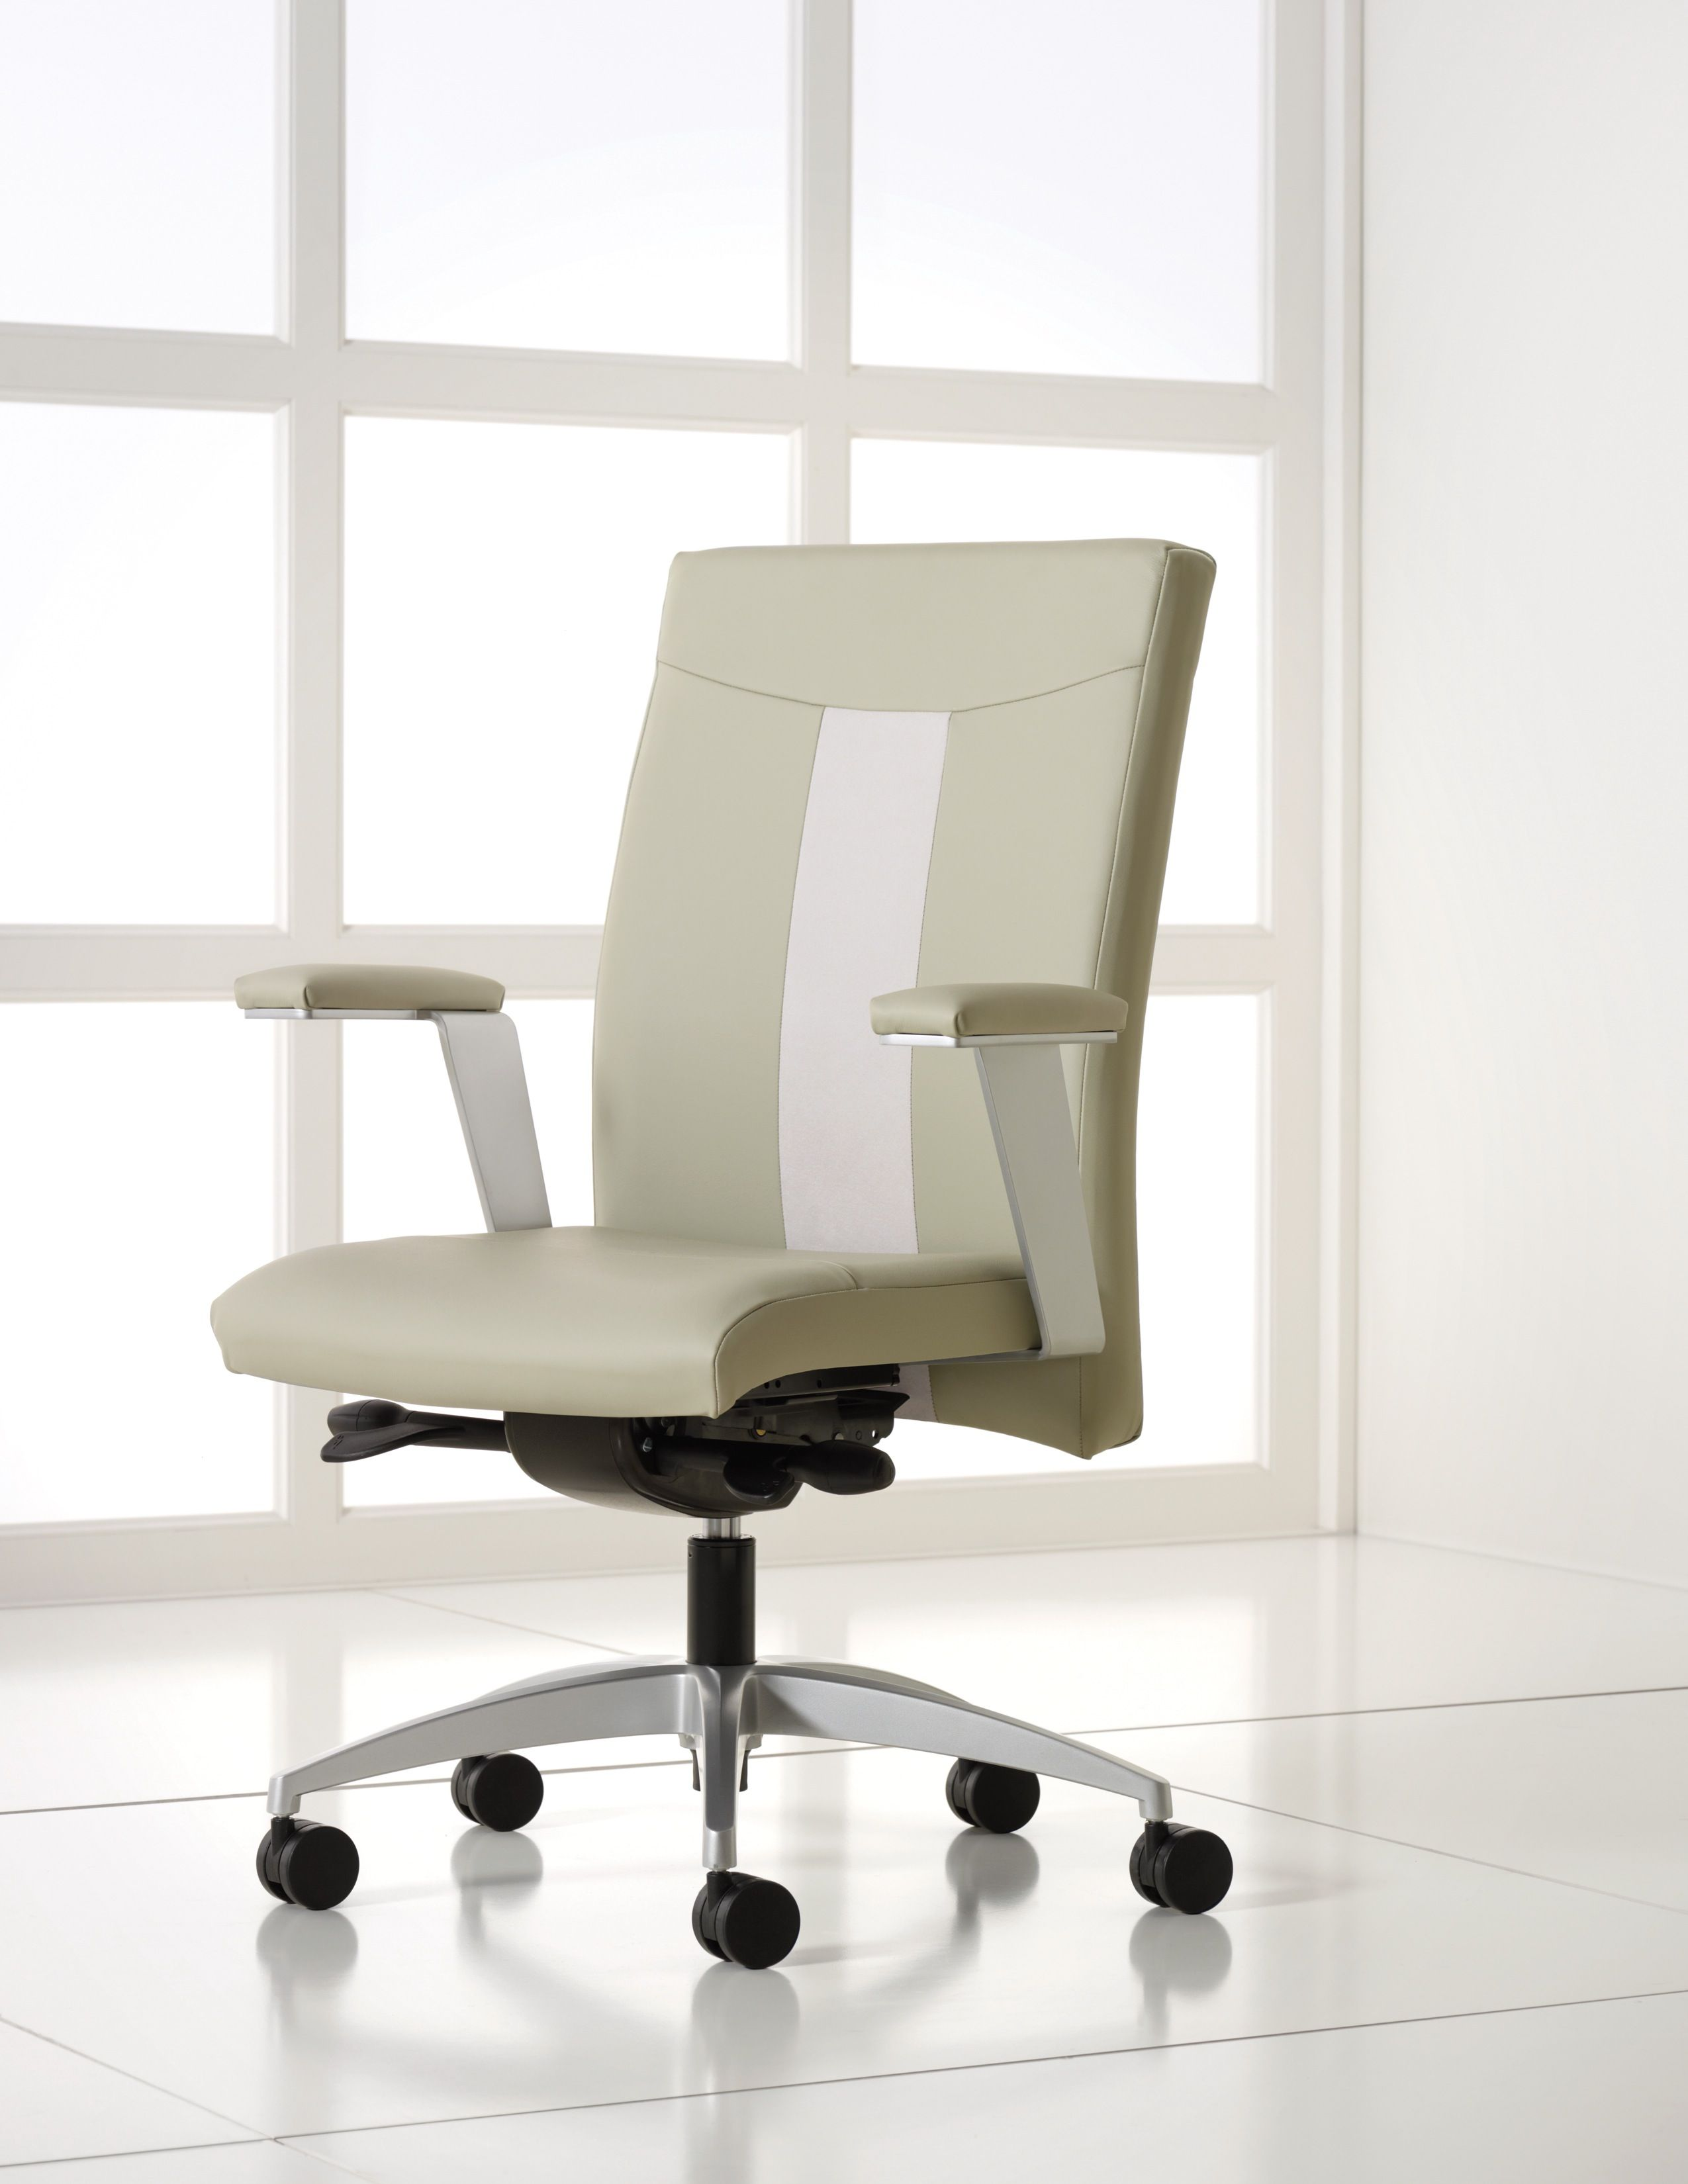 Brand: Jofco / Line: Aviva by Dorsey Cox Design / Our Price: $749